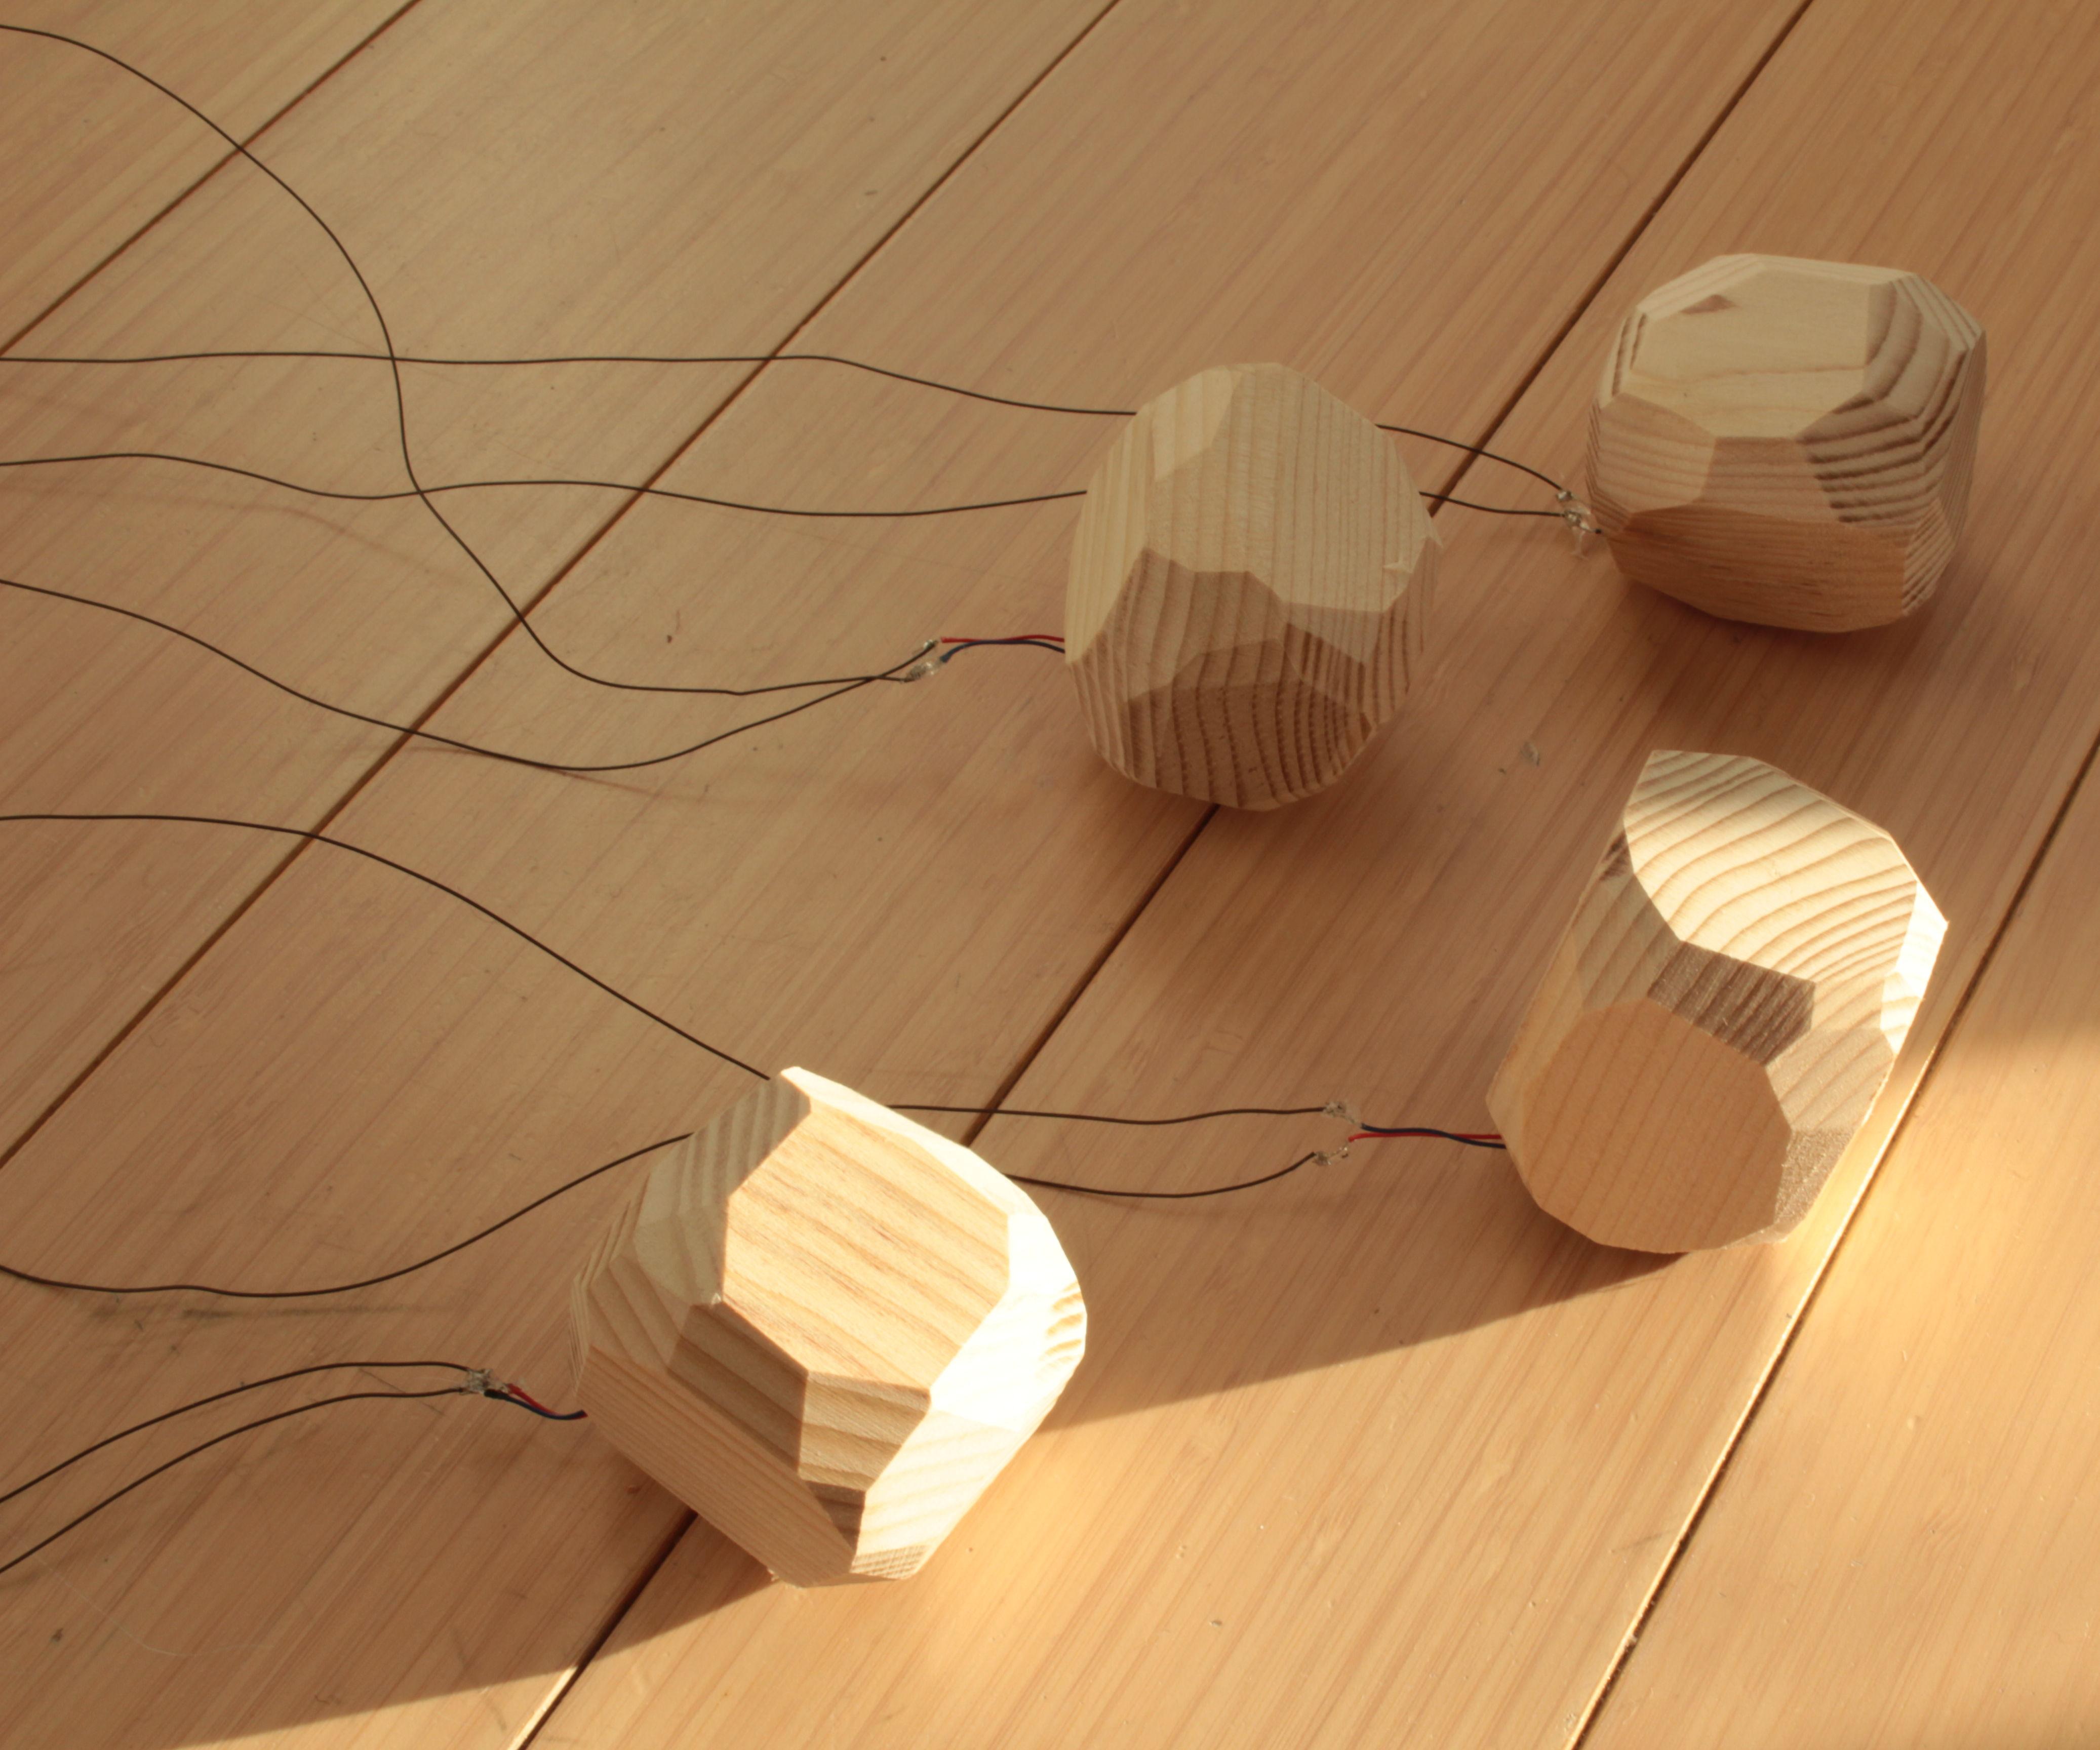 Wooden Stones Art Installation